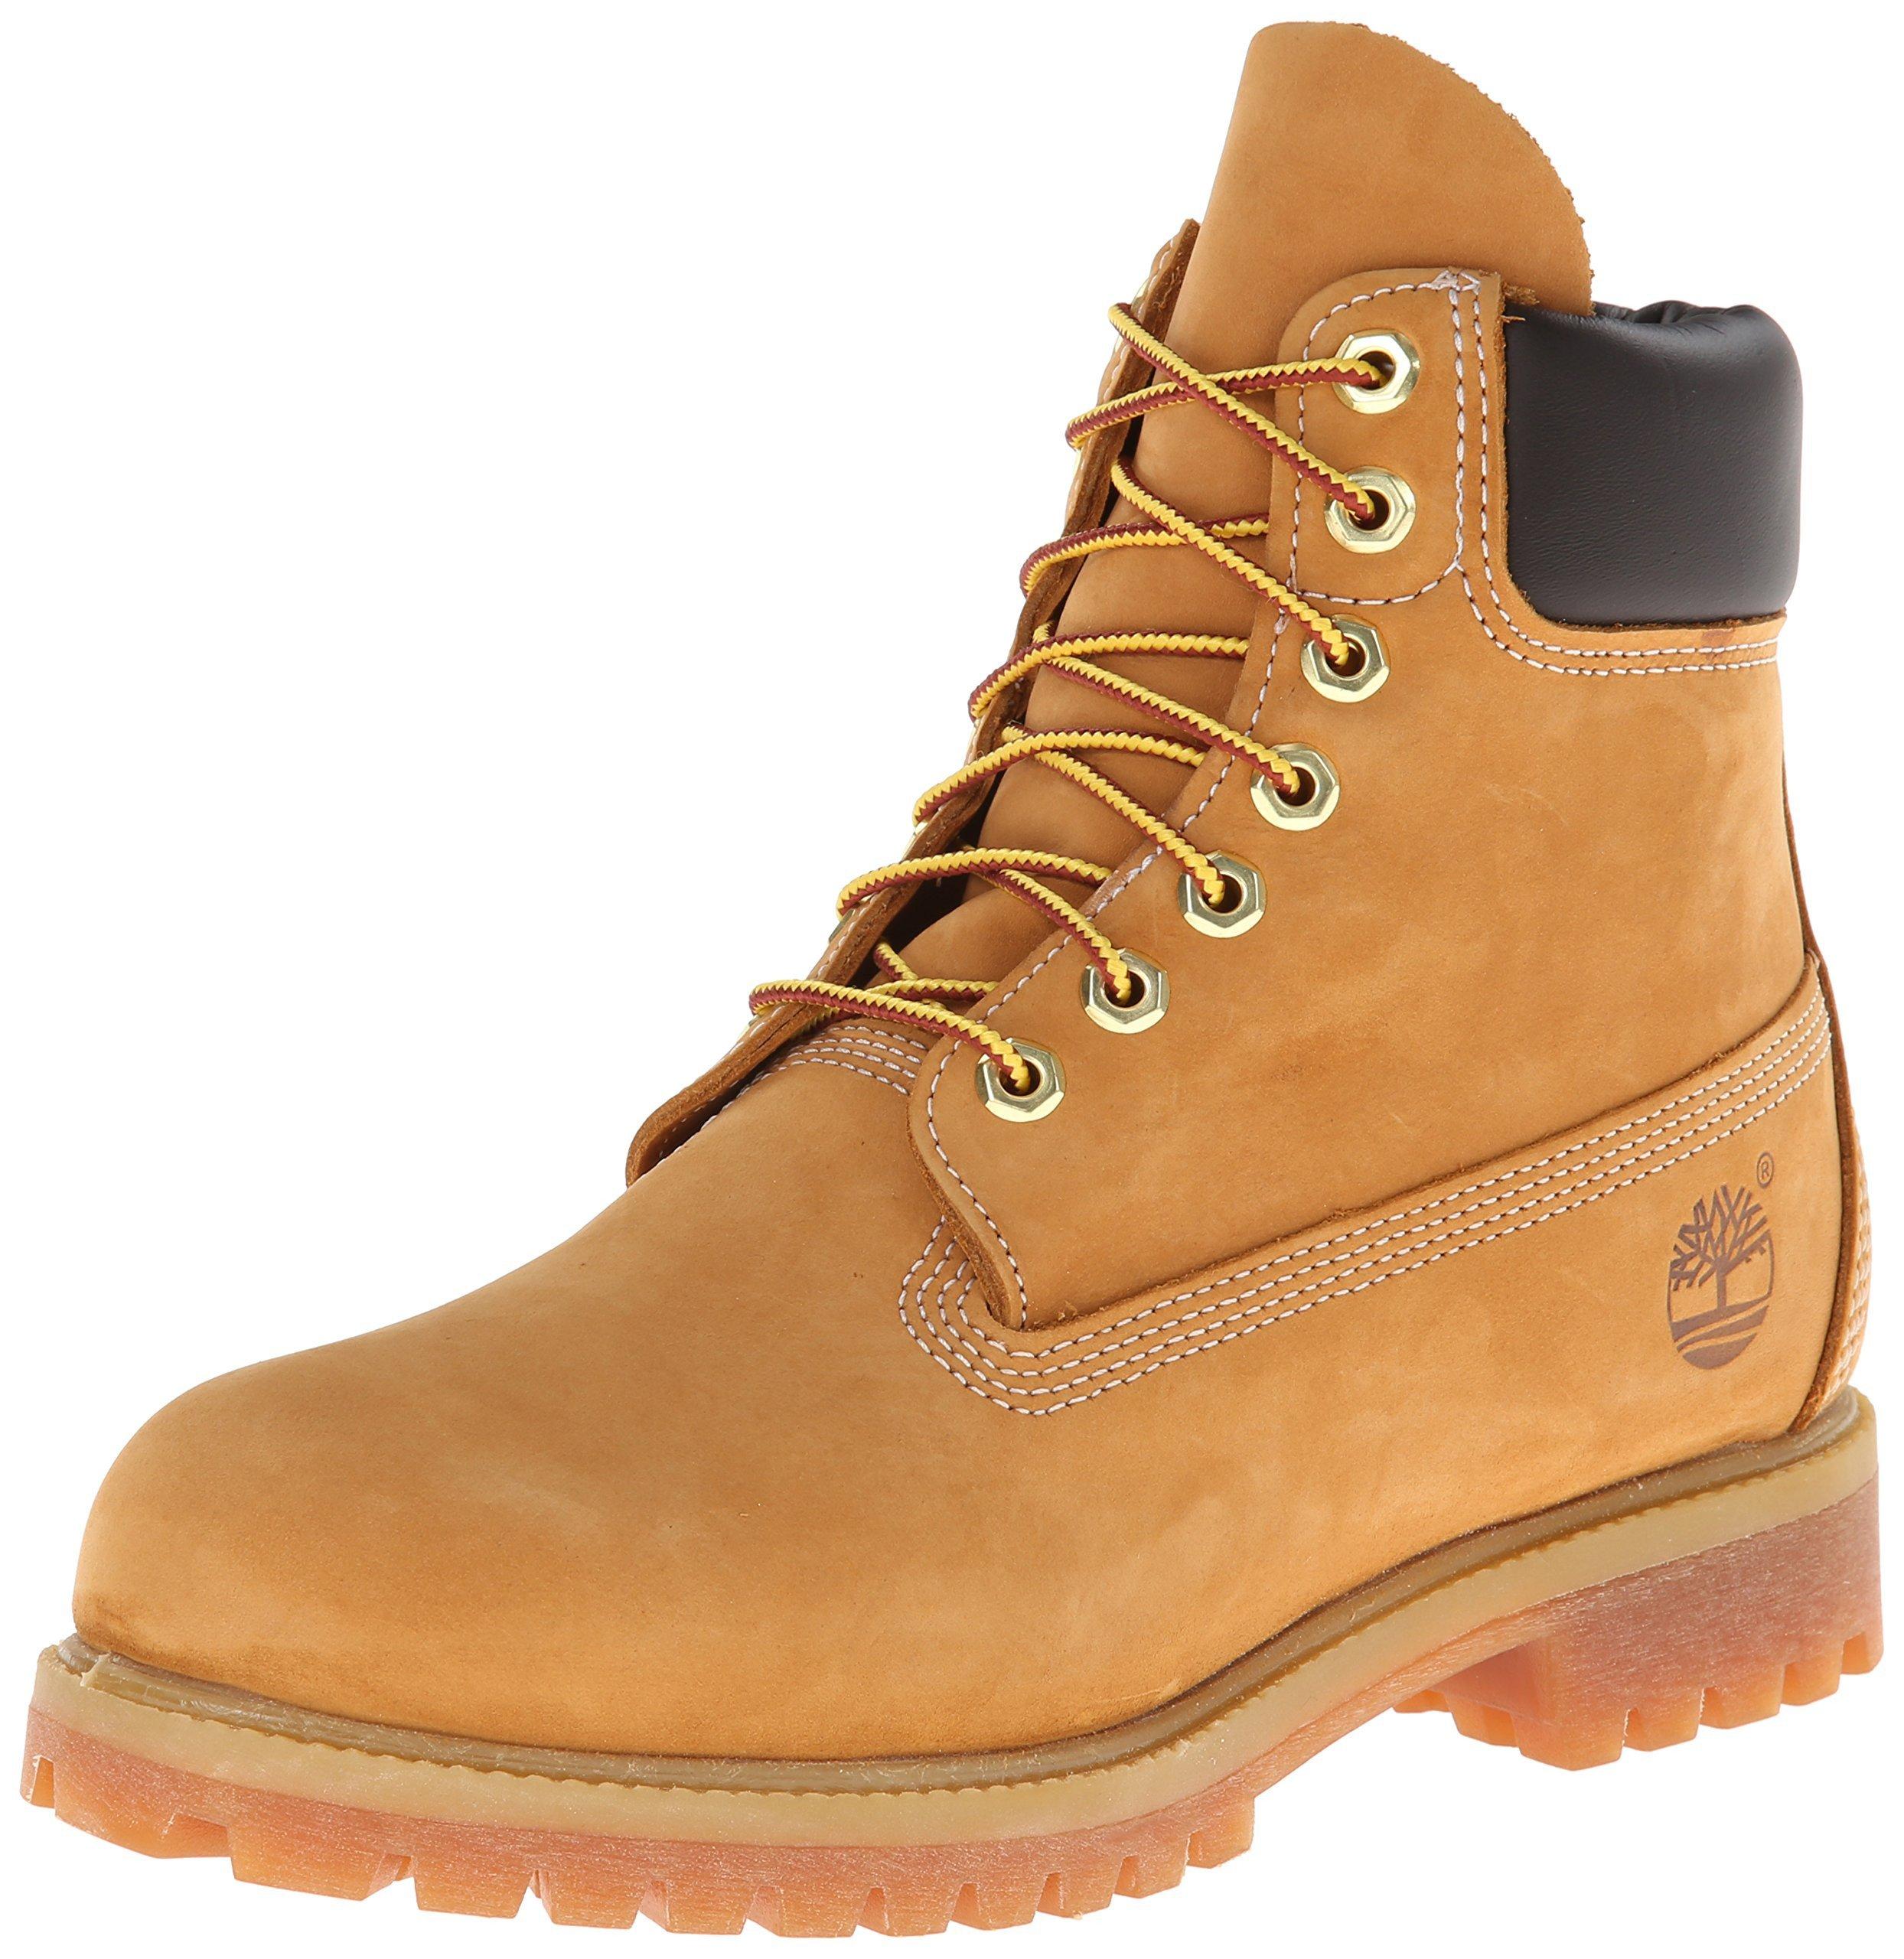 TB010061713 - Icon 6 Inch Premium Boot 10.5 / Wheat_Nubuck